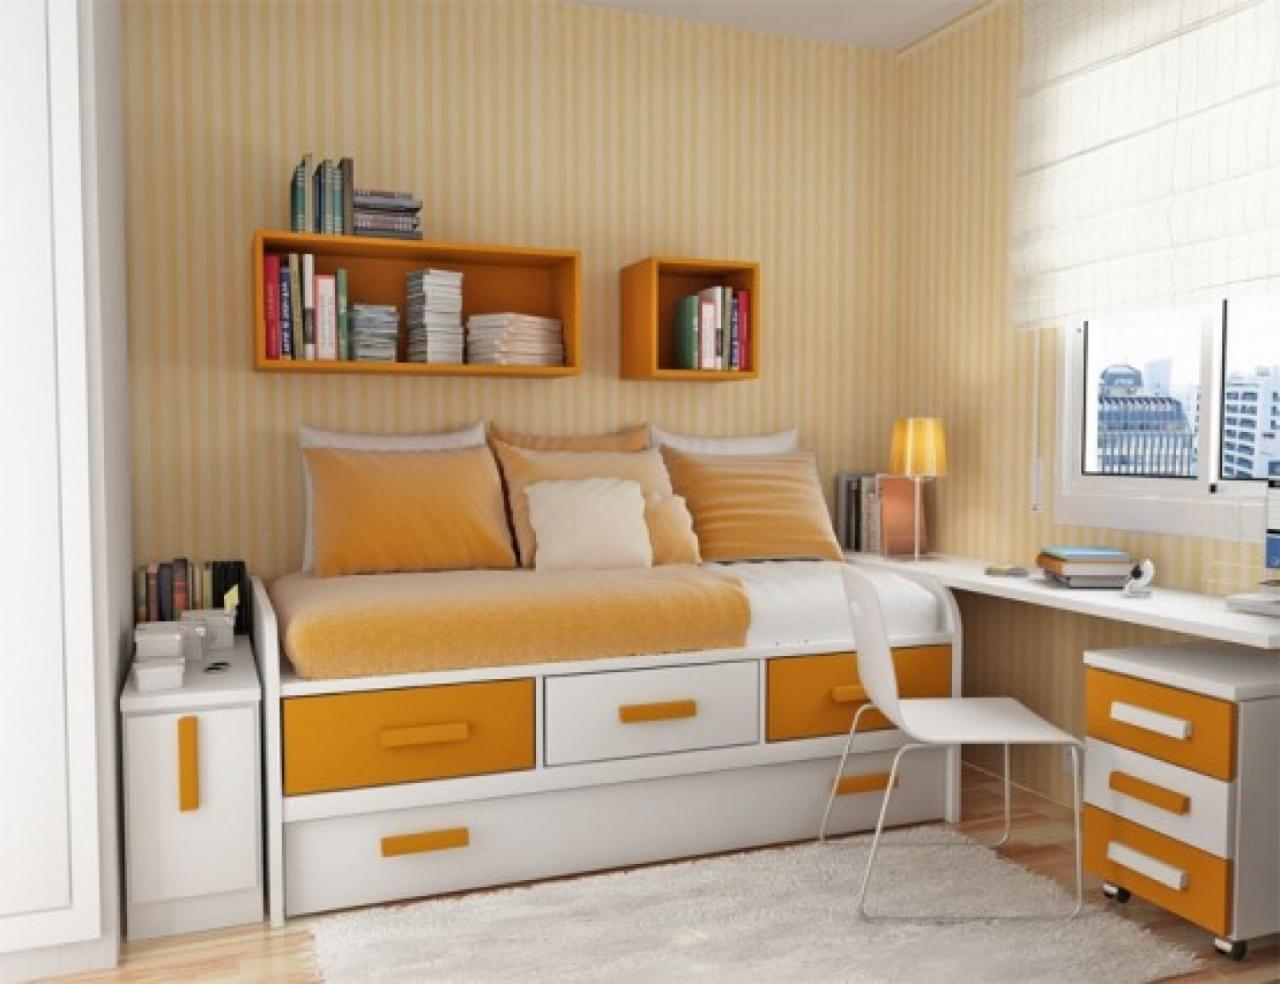 Cheap Childrens Bedroom Furniture Sets - Decor IdeasDecor ...